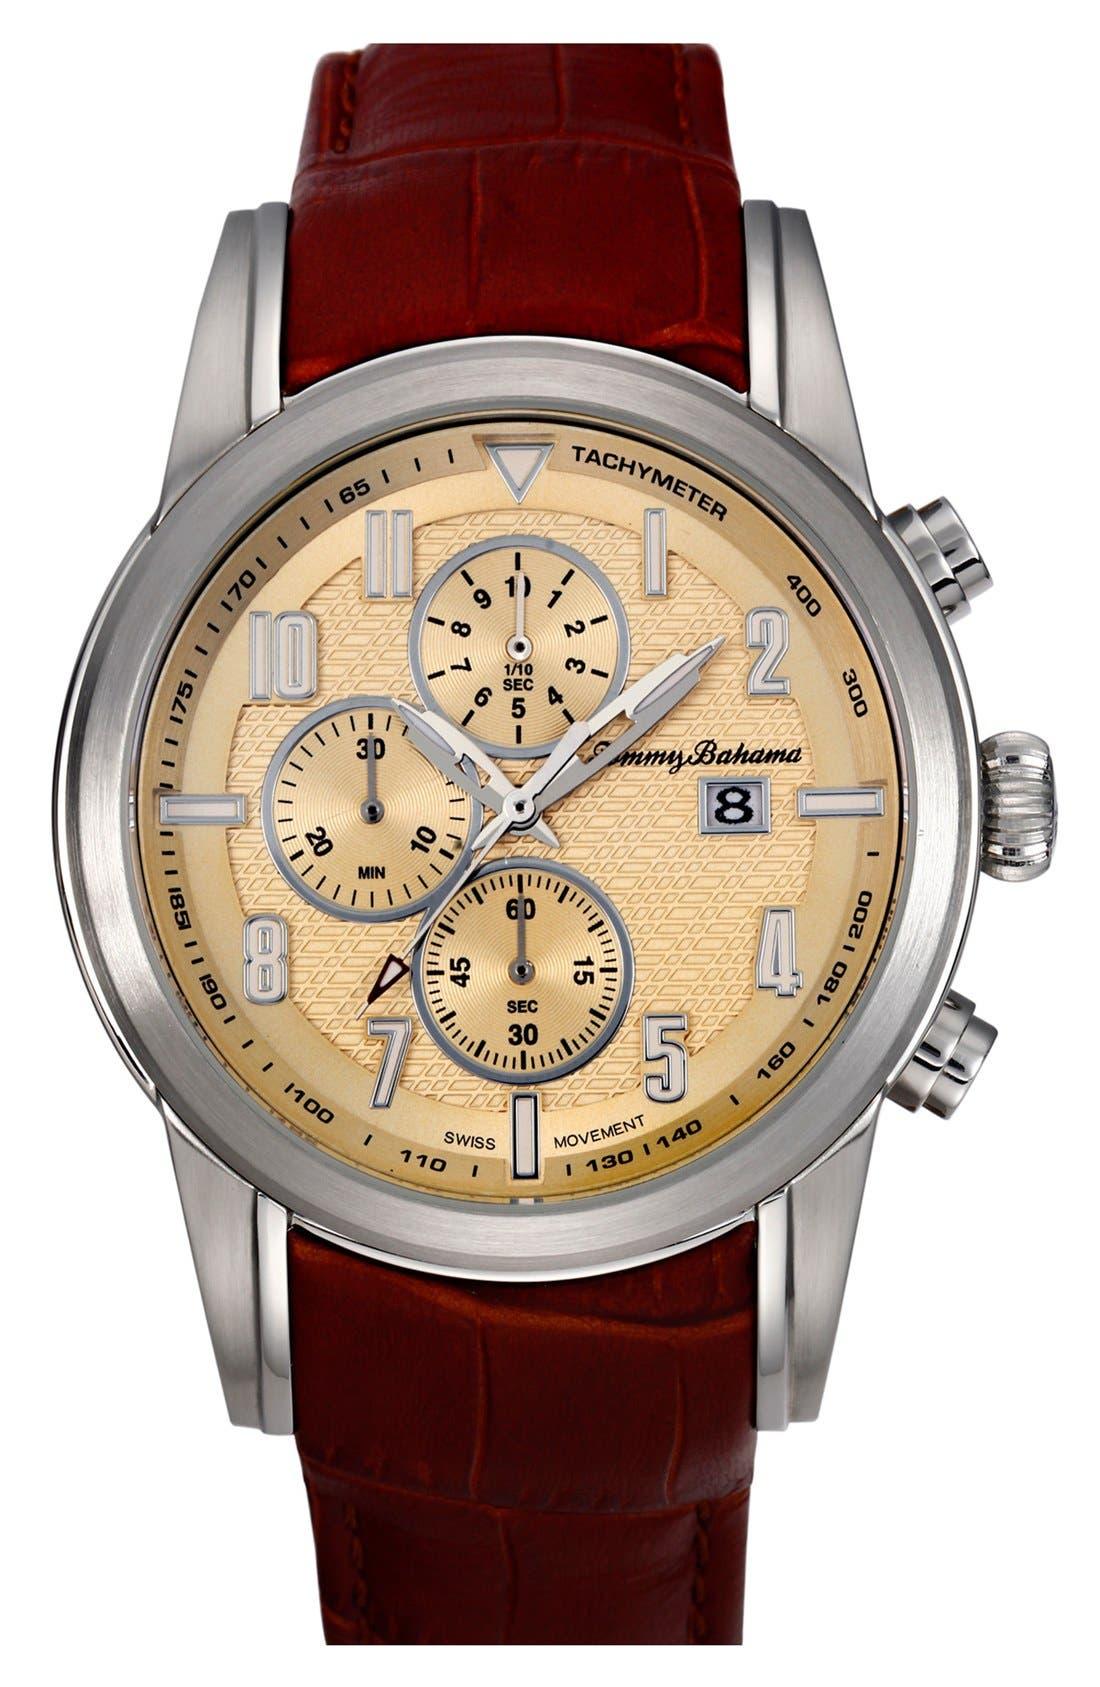 Main Image - Tommy Bahama 'Havana Pilot' Chronograph Leather Strap Watch, 44mm